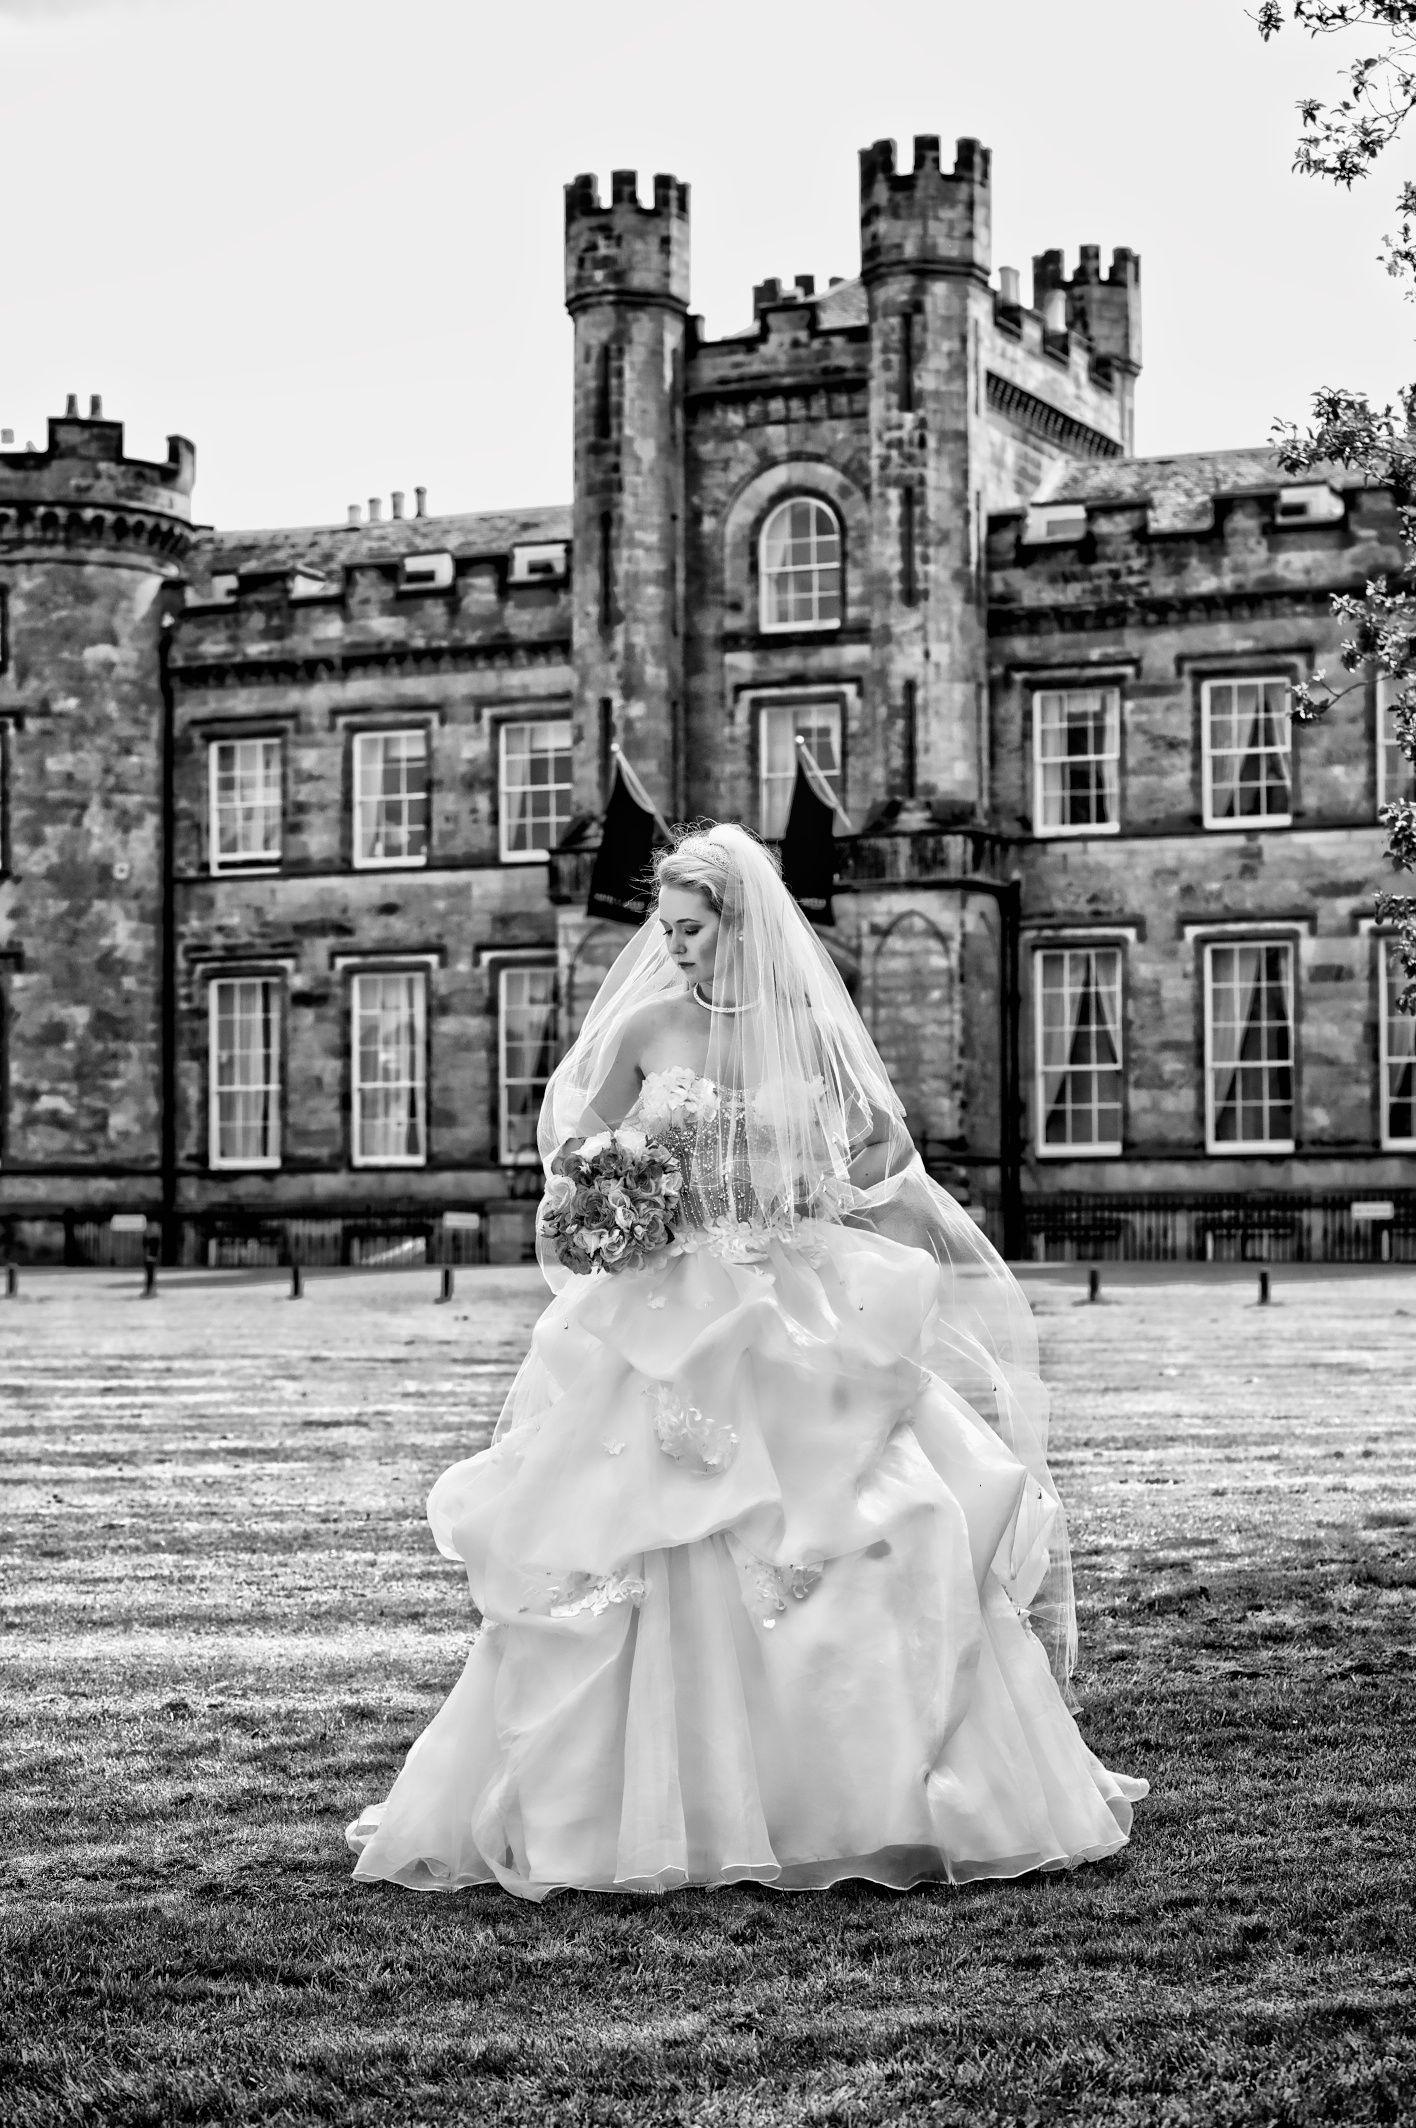 www.martinmclachlanphotography.co.uk